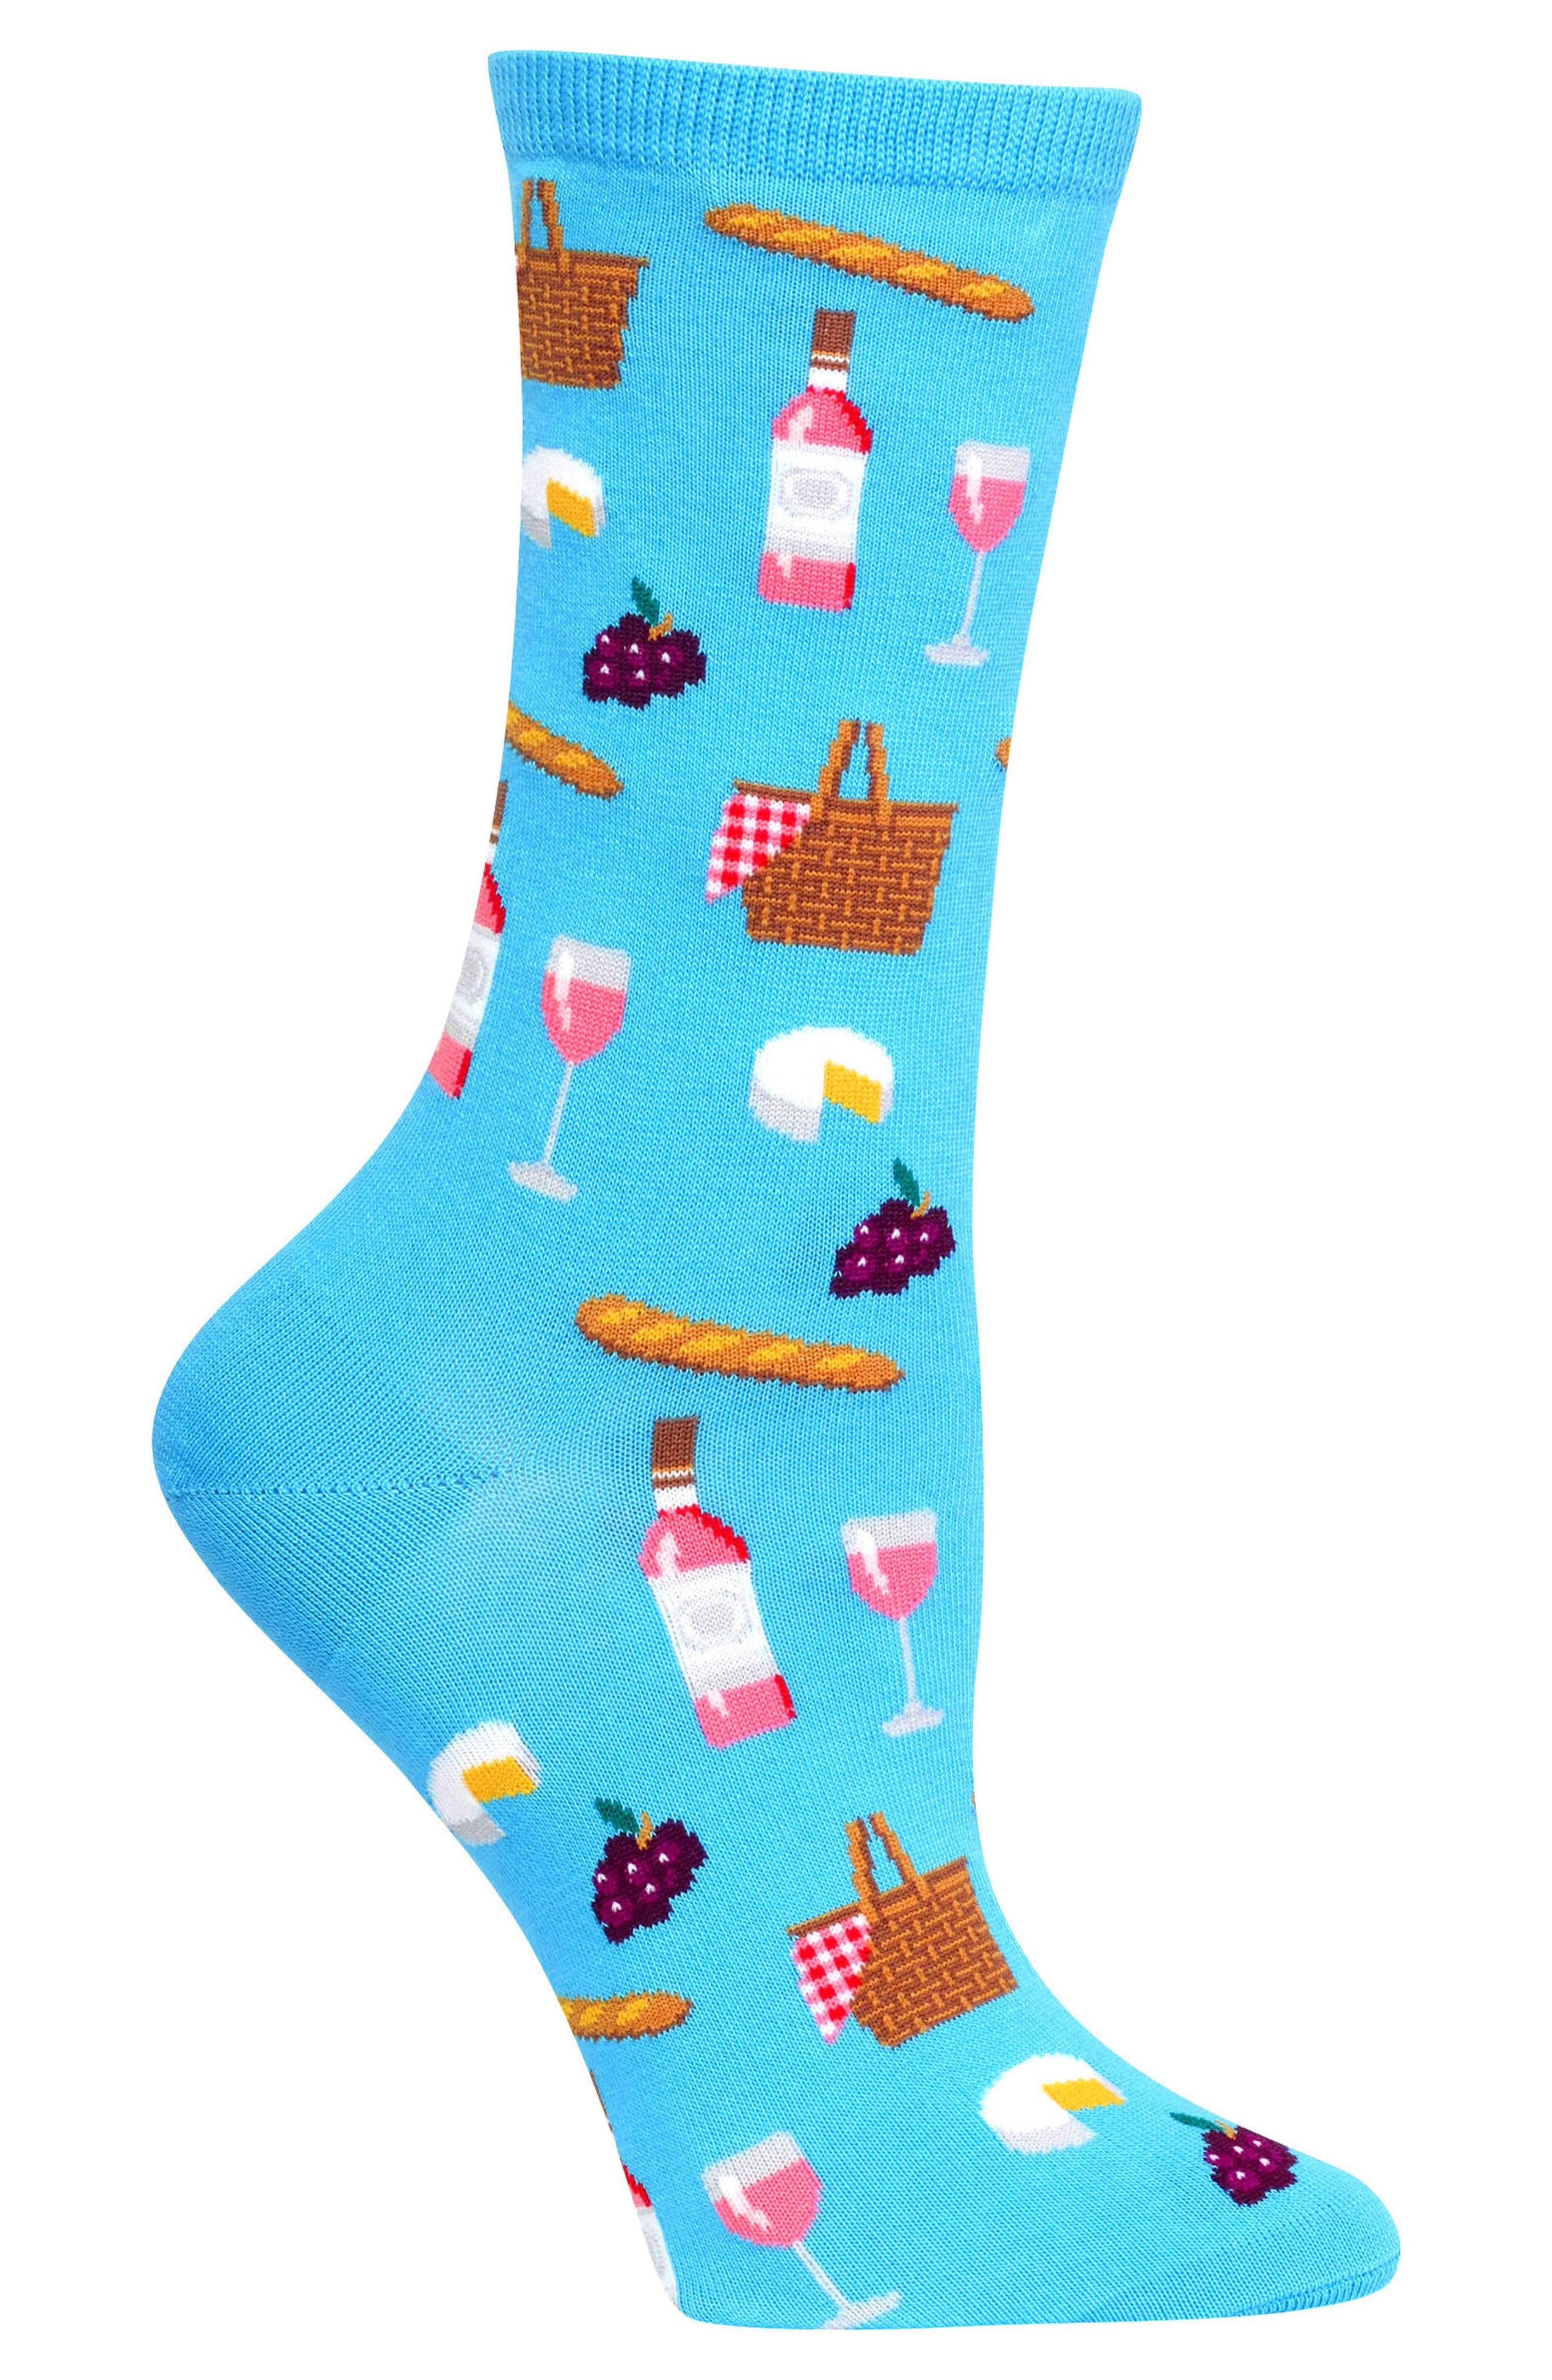 Picnic Crew Socks,                             Alternate thumbnail 3, color,                             Light Blue